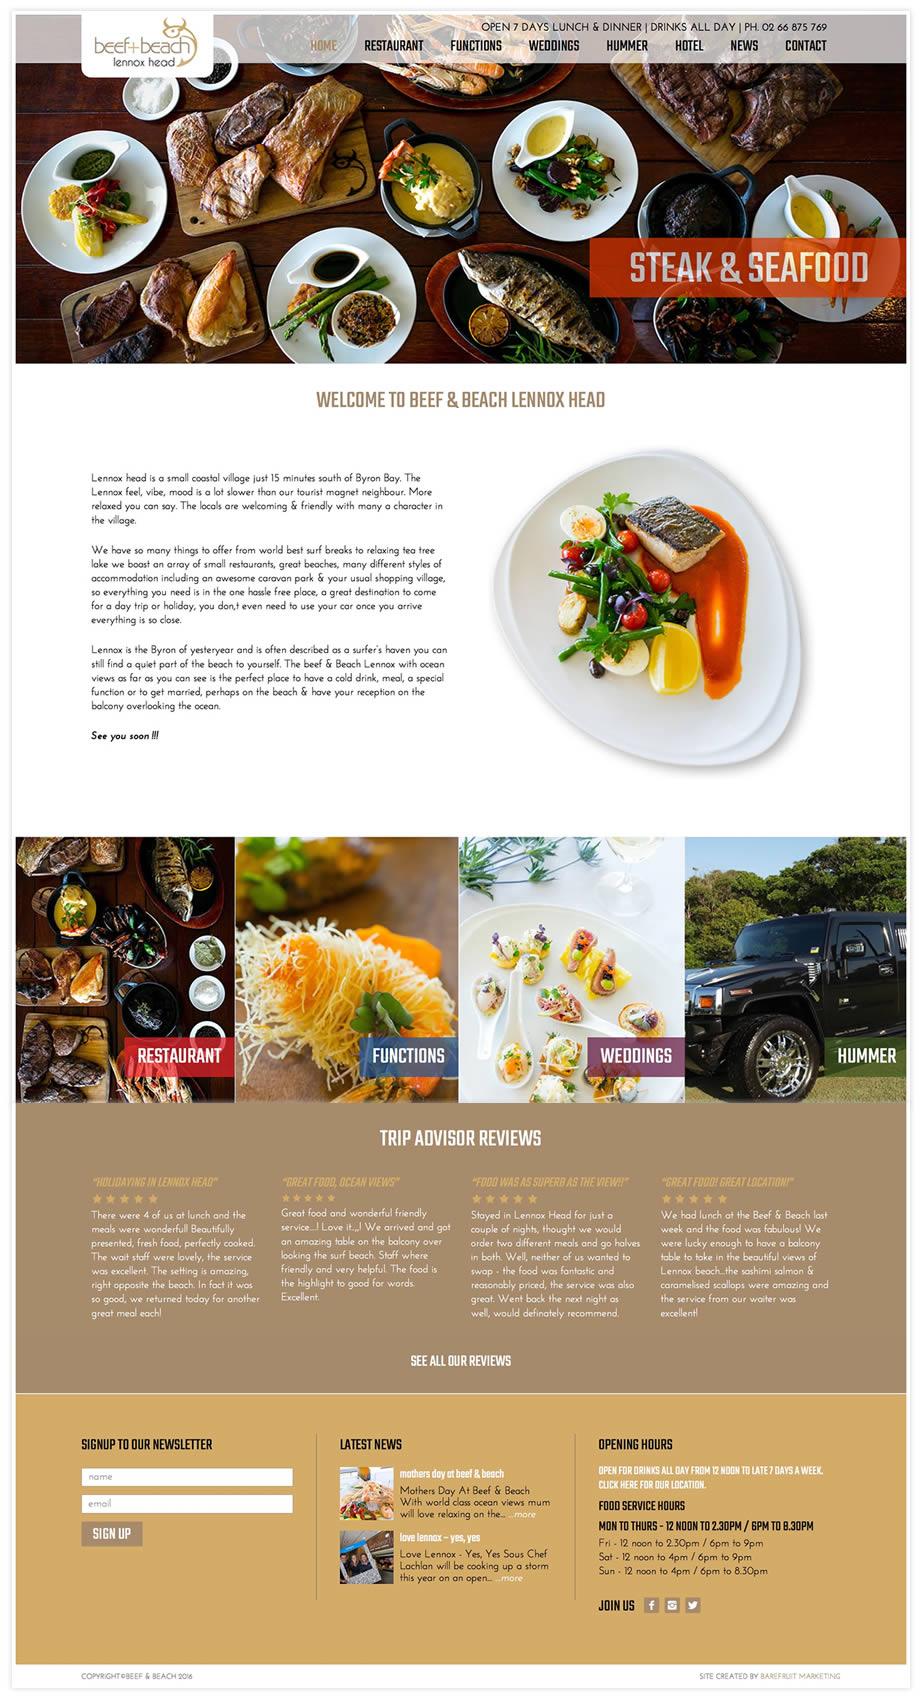 beef-beach-homepage